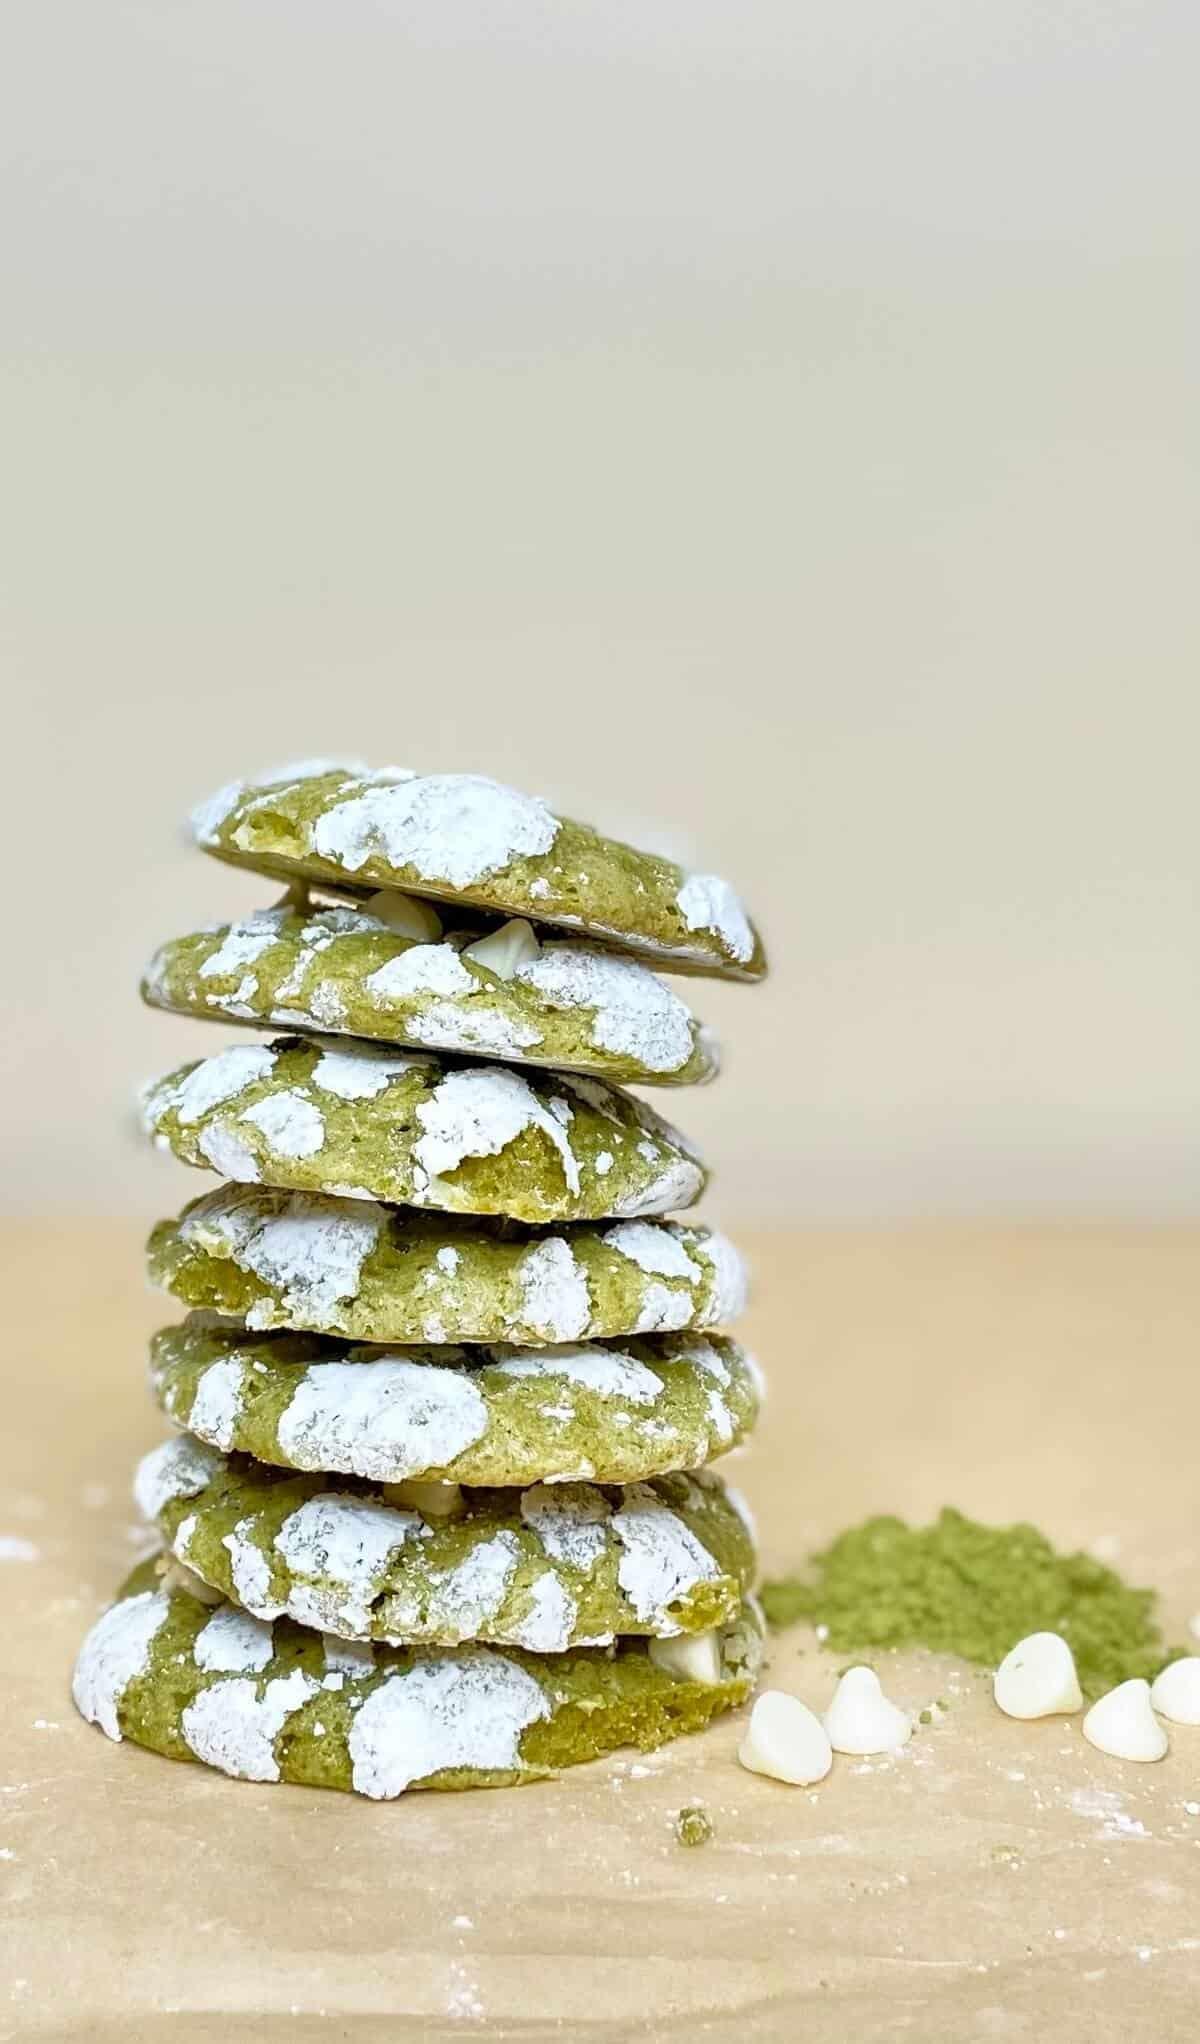 Matcha Crinkle Cookies (Photo by Viana Boenzli)